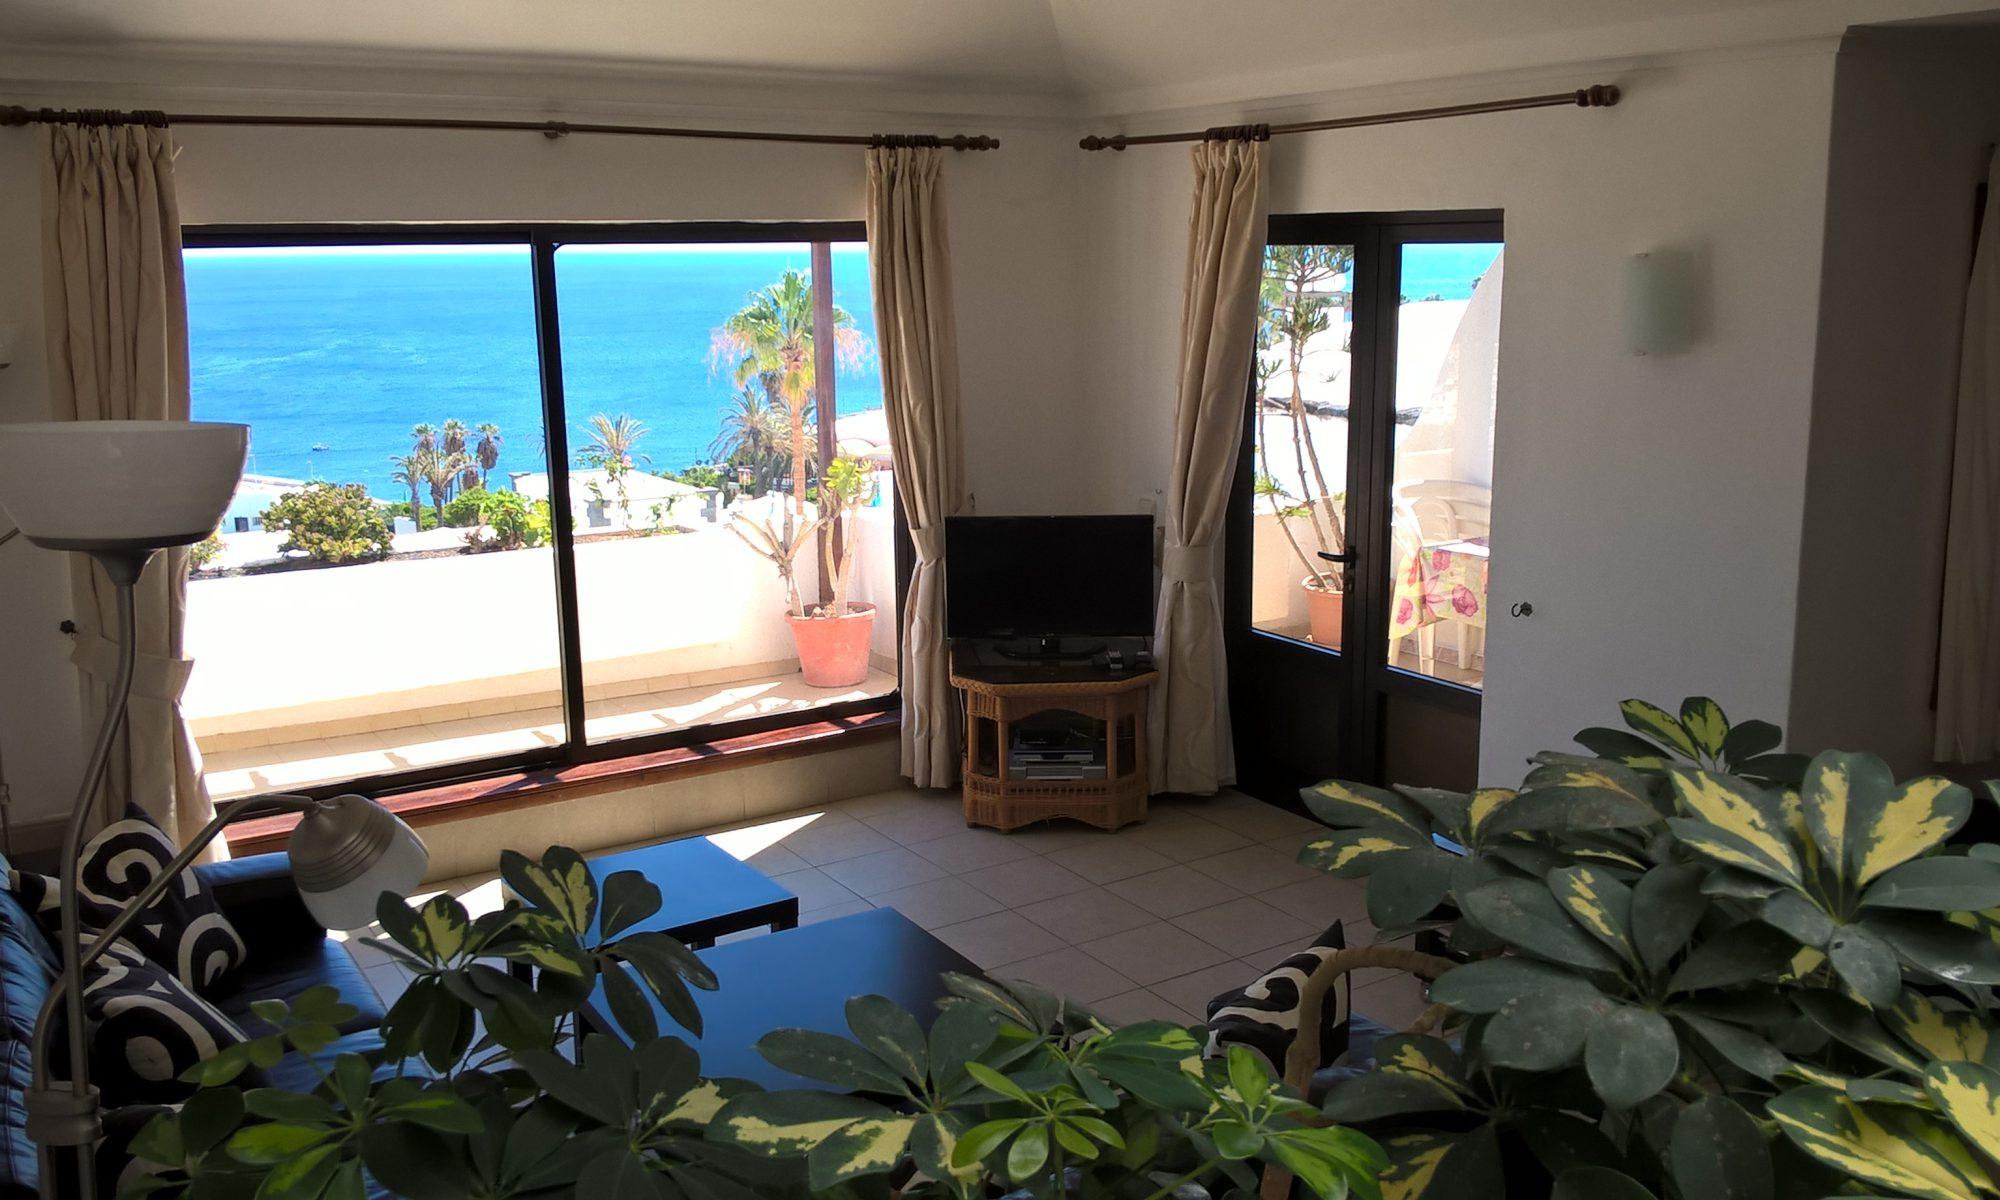 Penthouse, Lago Verde, Old Town, Puerto del Carmen, Lanzarote View